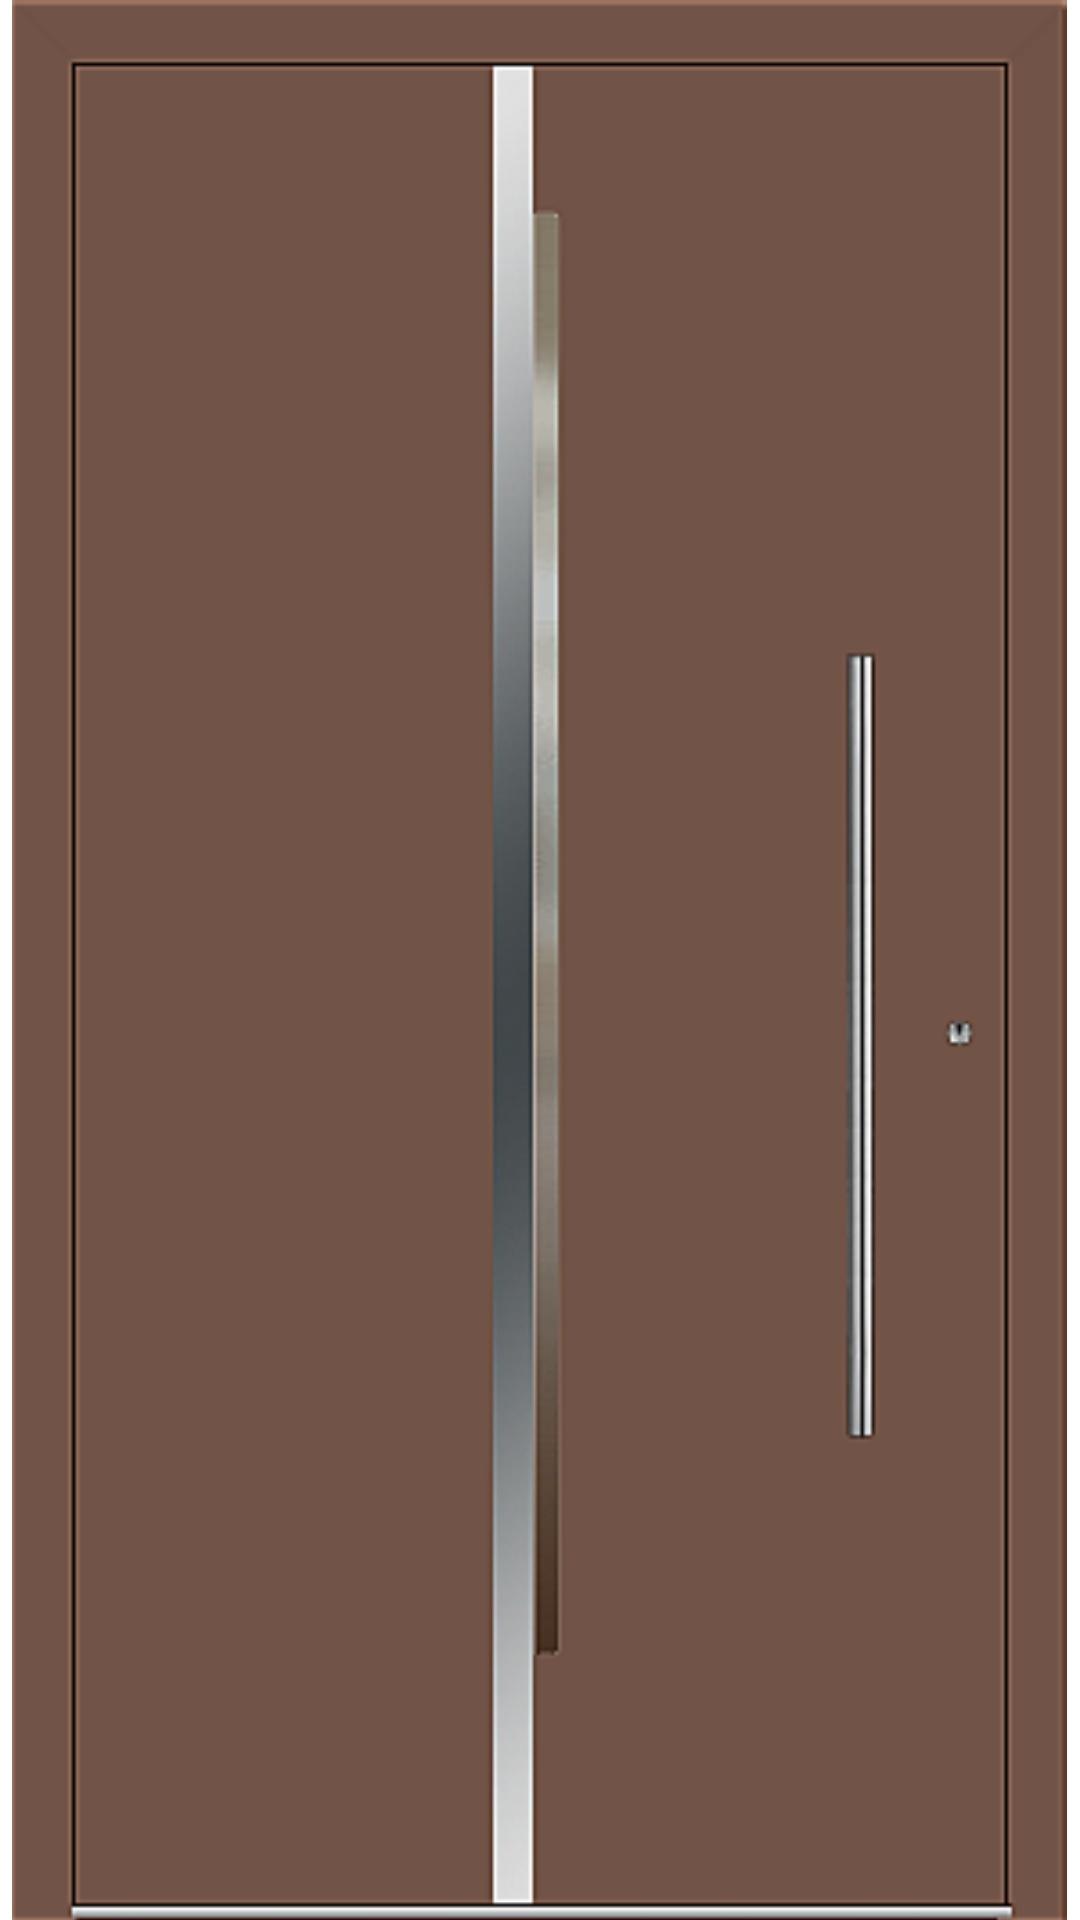 PaXentrée Aluminium Haustür M02201 lehmbraun